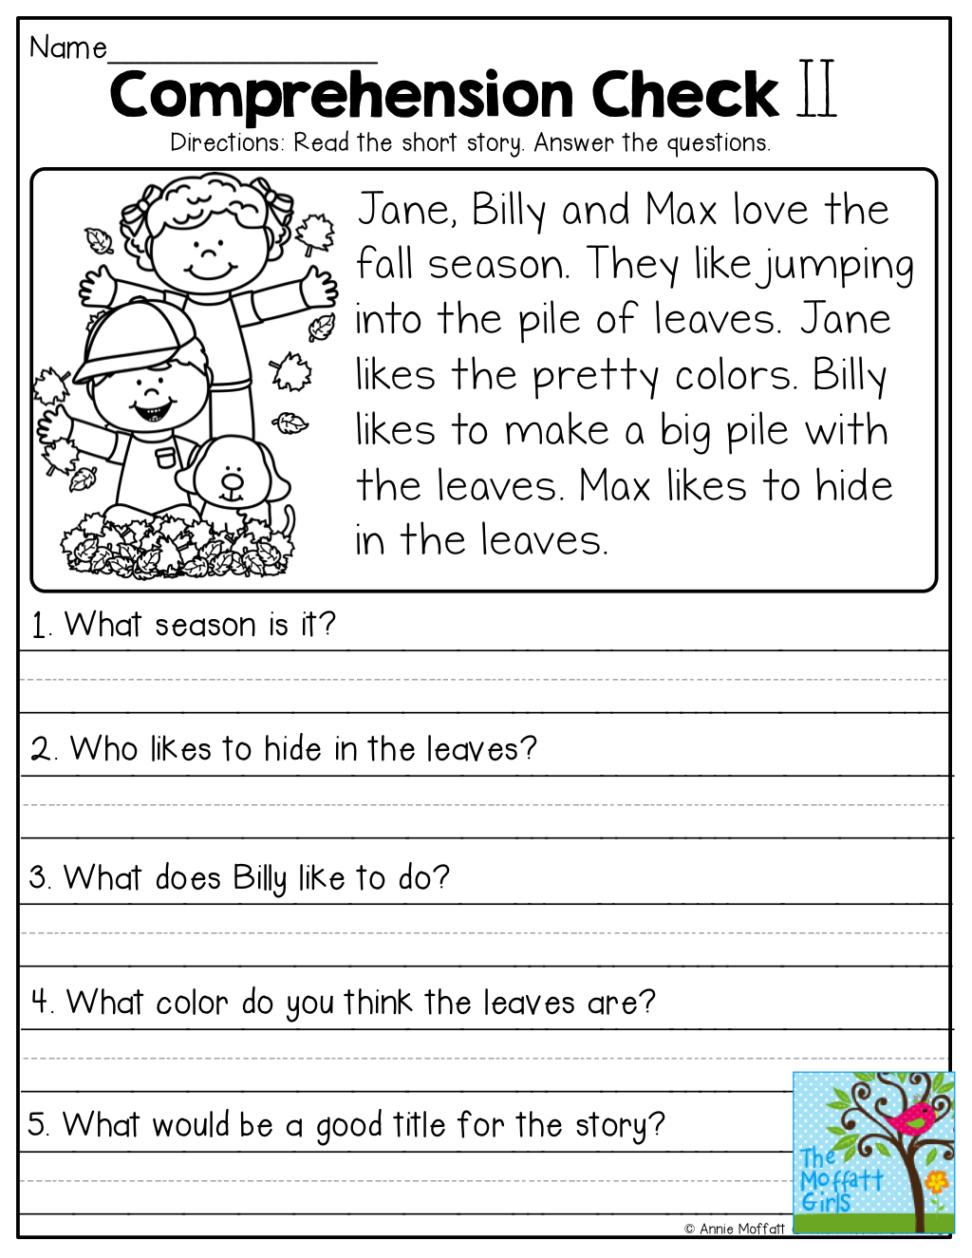 Worksheet. Free Printable Reading Comprehension Worksheets - Free | Free Printable Reading Comprehension Worksheets For Adults